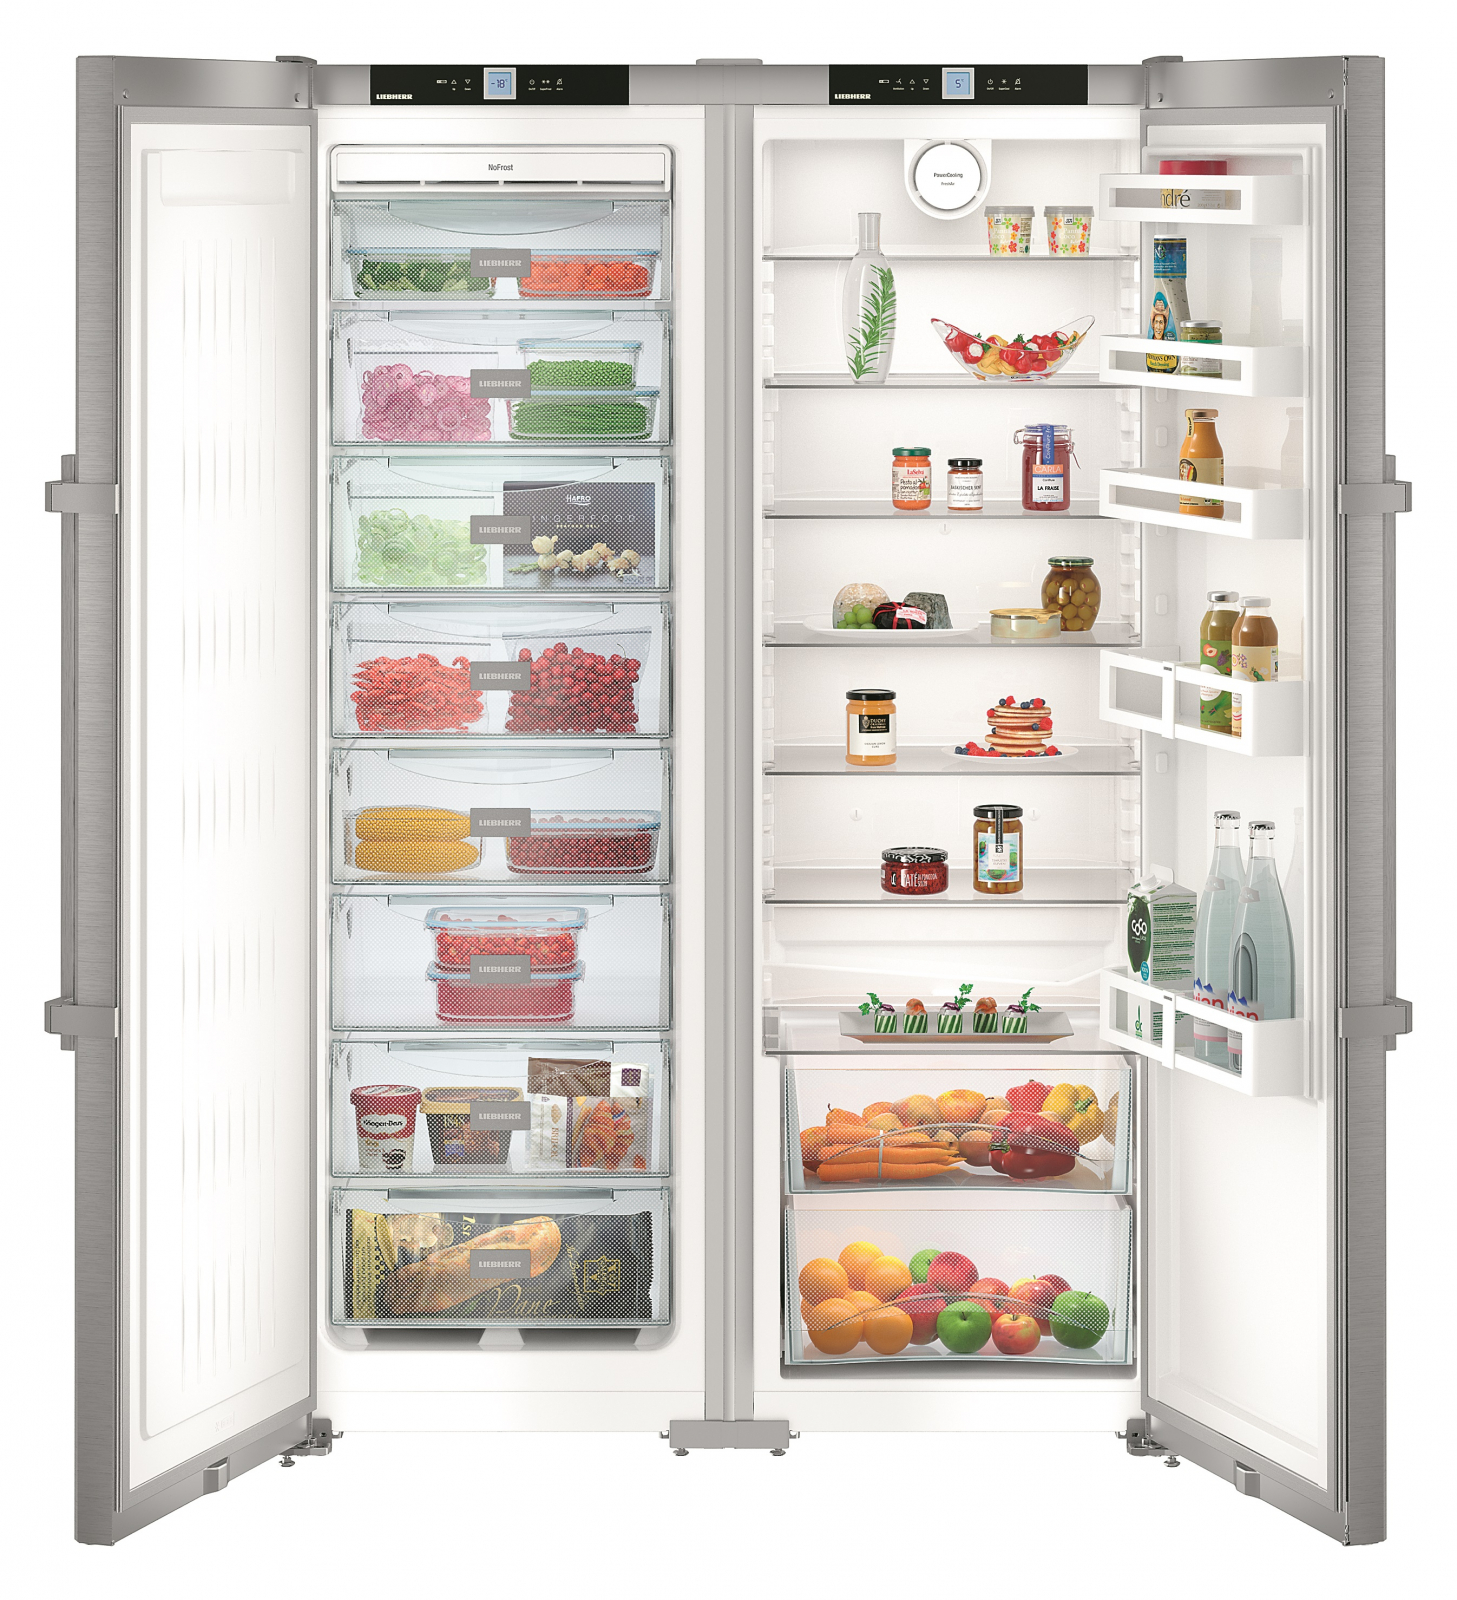 Side-by-side холодильник Liebherr SBSef 7242 купить украина